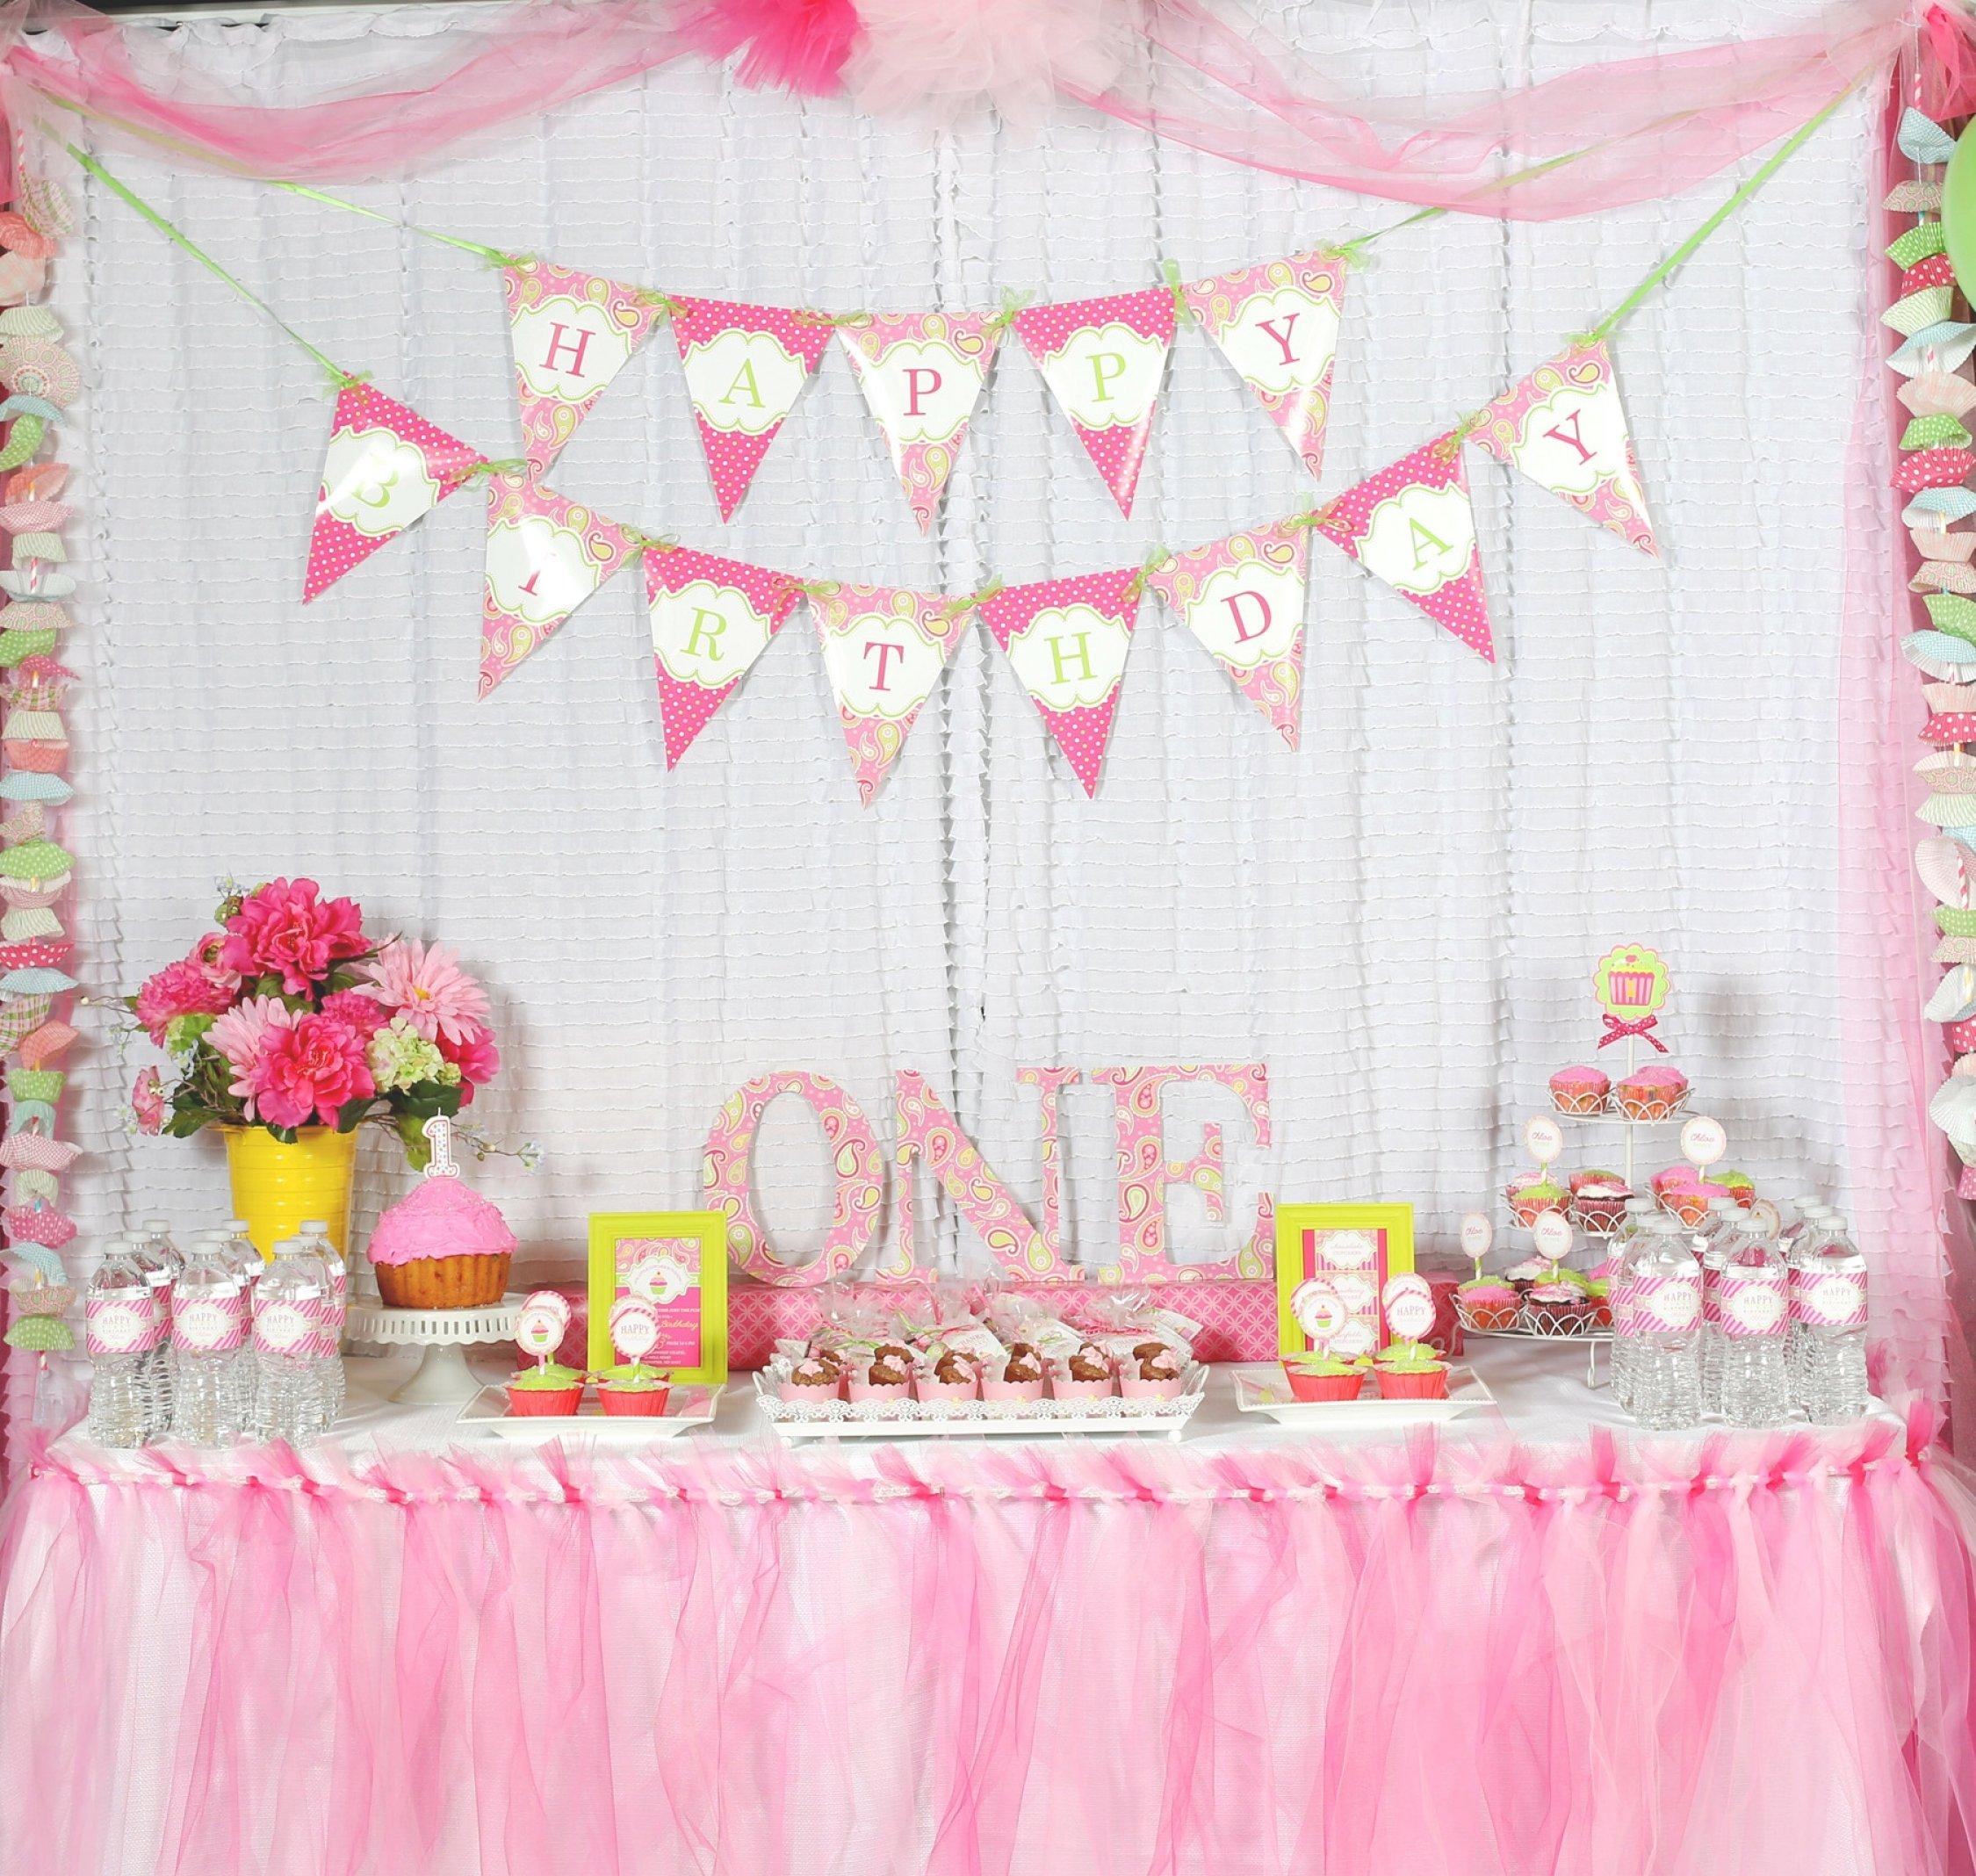 10 Stylish 1St Birthday Party Decoration Ideas first birthday party decoration ideas a cupcake themed 1st birthday